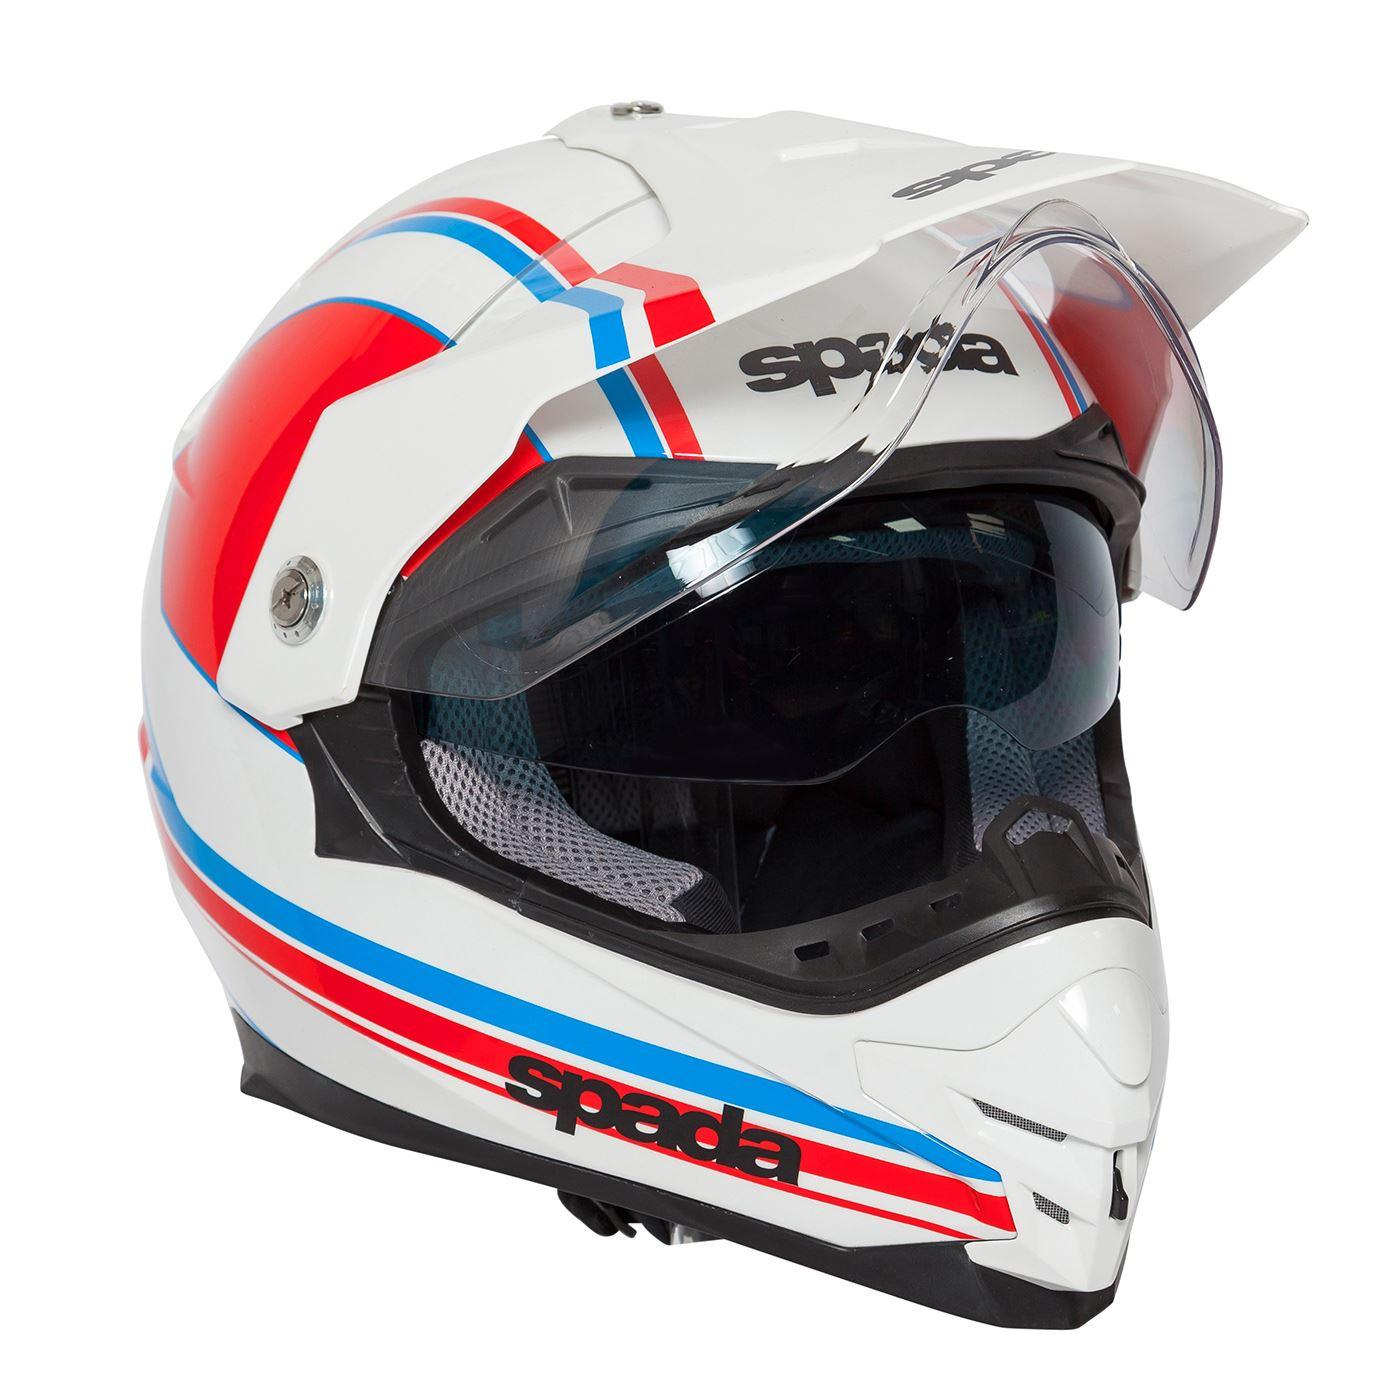 Spada-Intrepid-Full-Face-Motorcycle-Off-Road-Adventure-Style-Helmet-Sun-Visor thumbnail 26